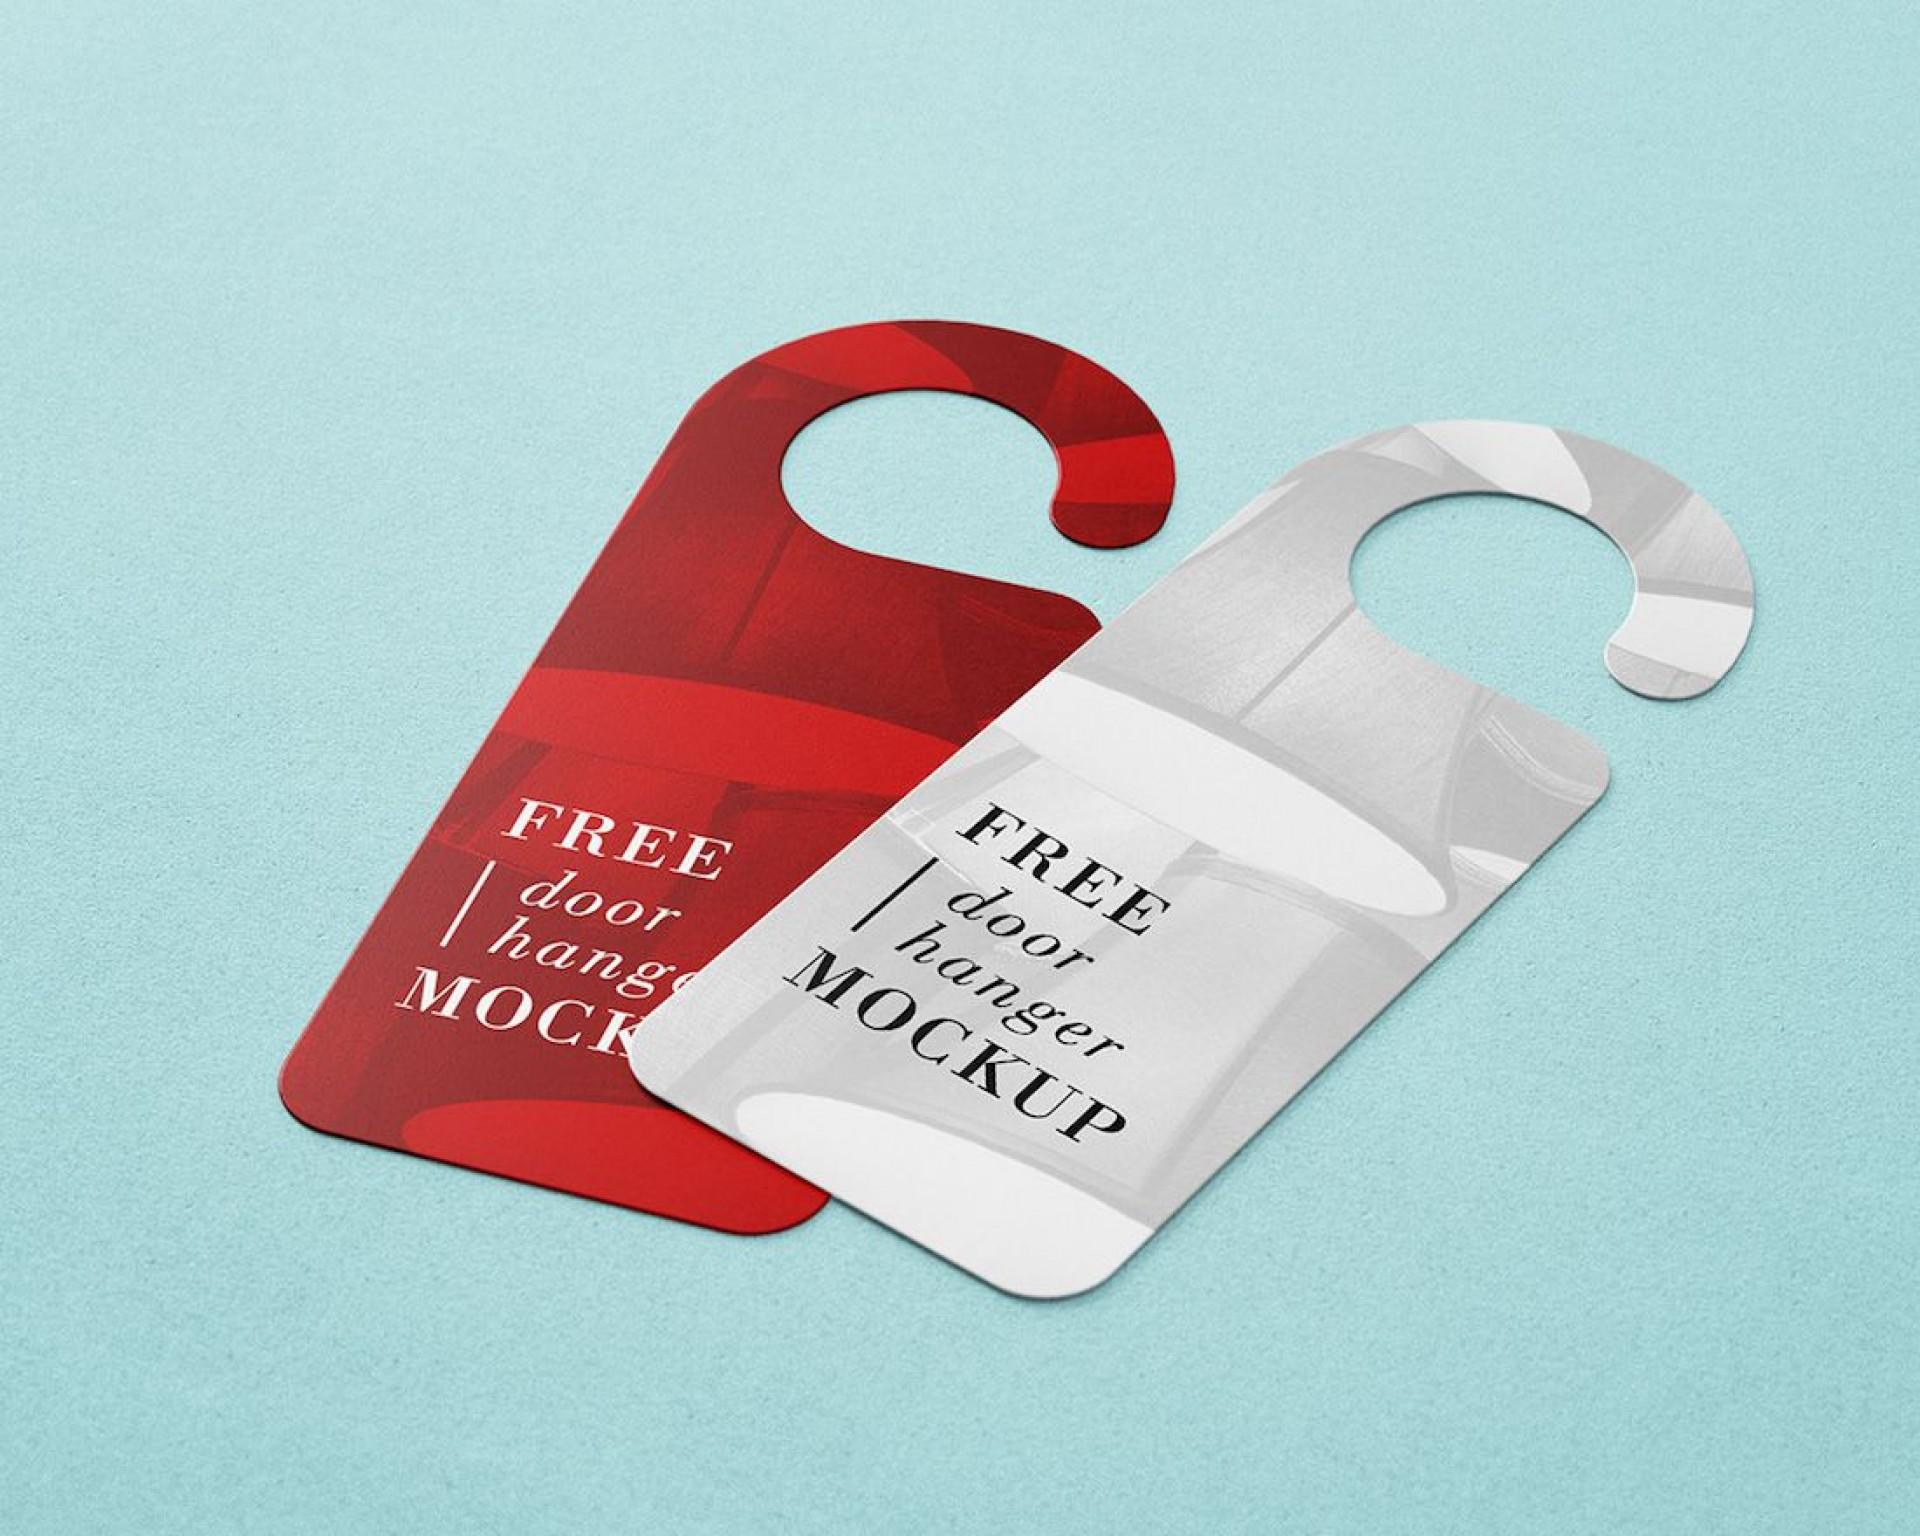 004 Shocking Free Template For Door Hanger High Resolution  Hangers Printable Knob1920